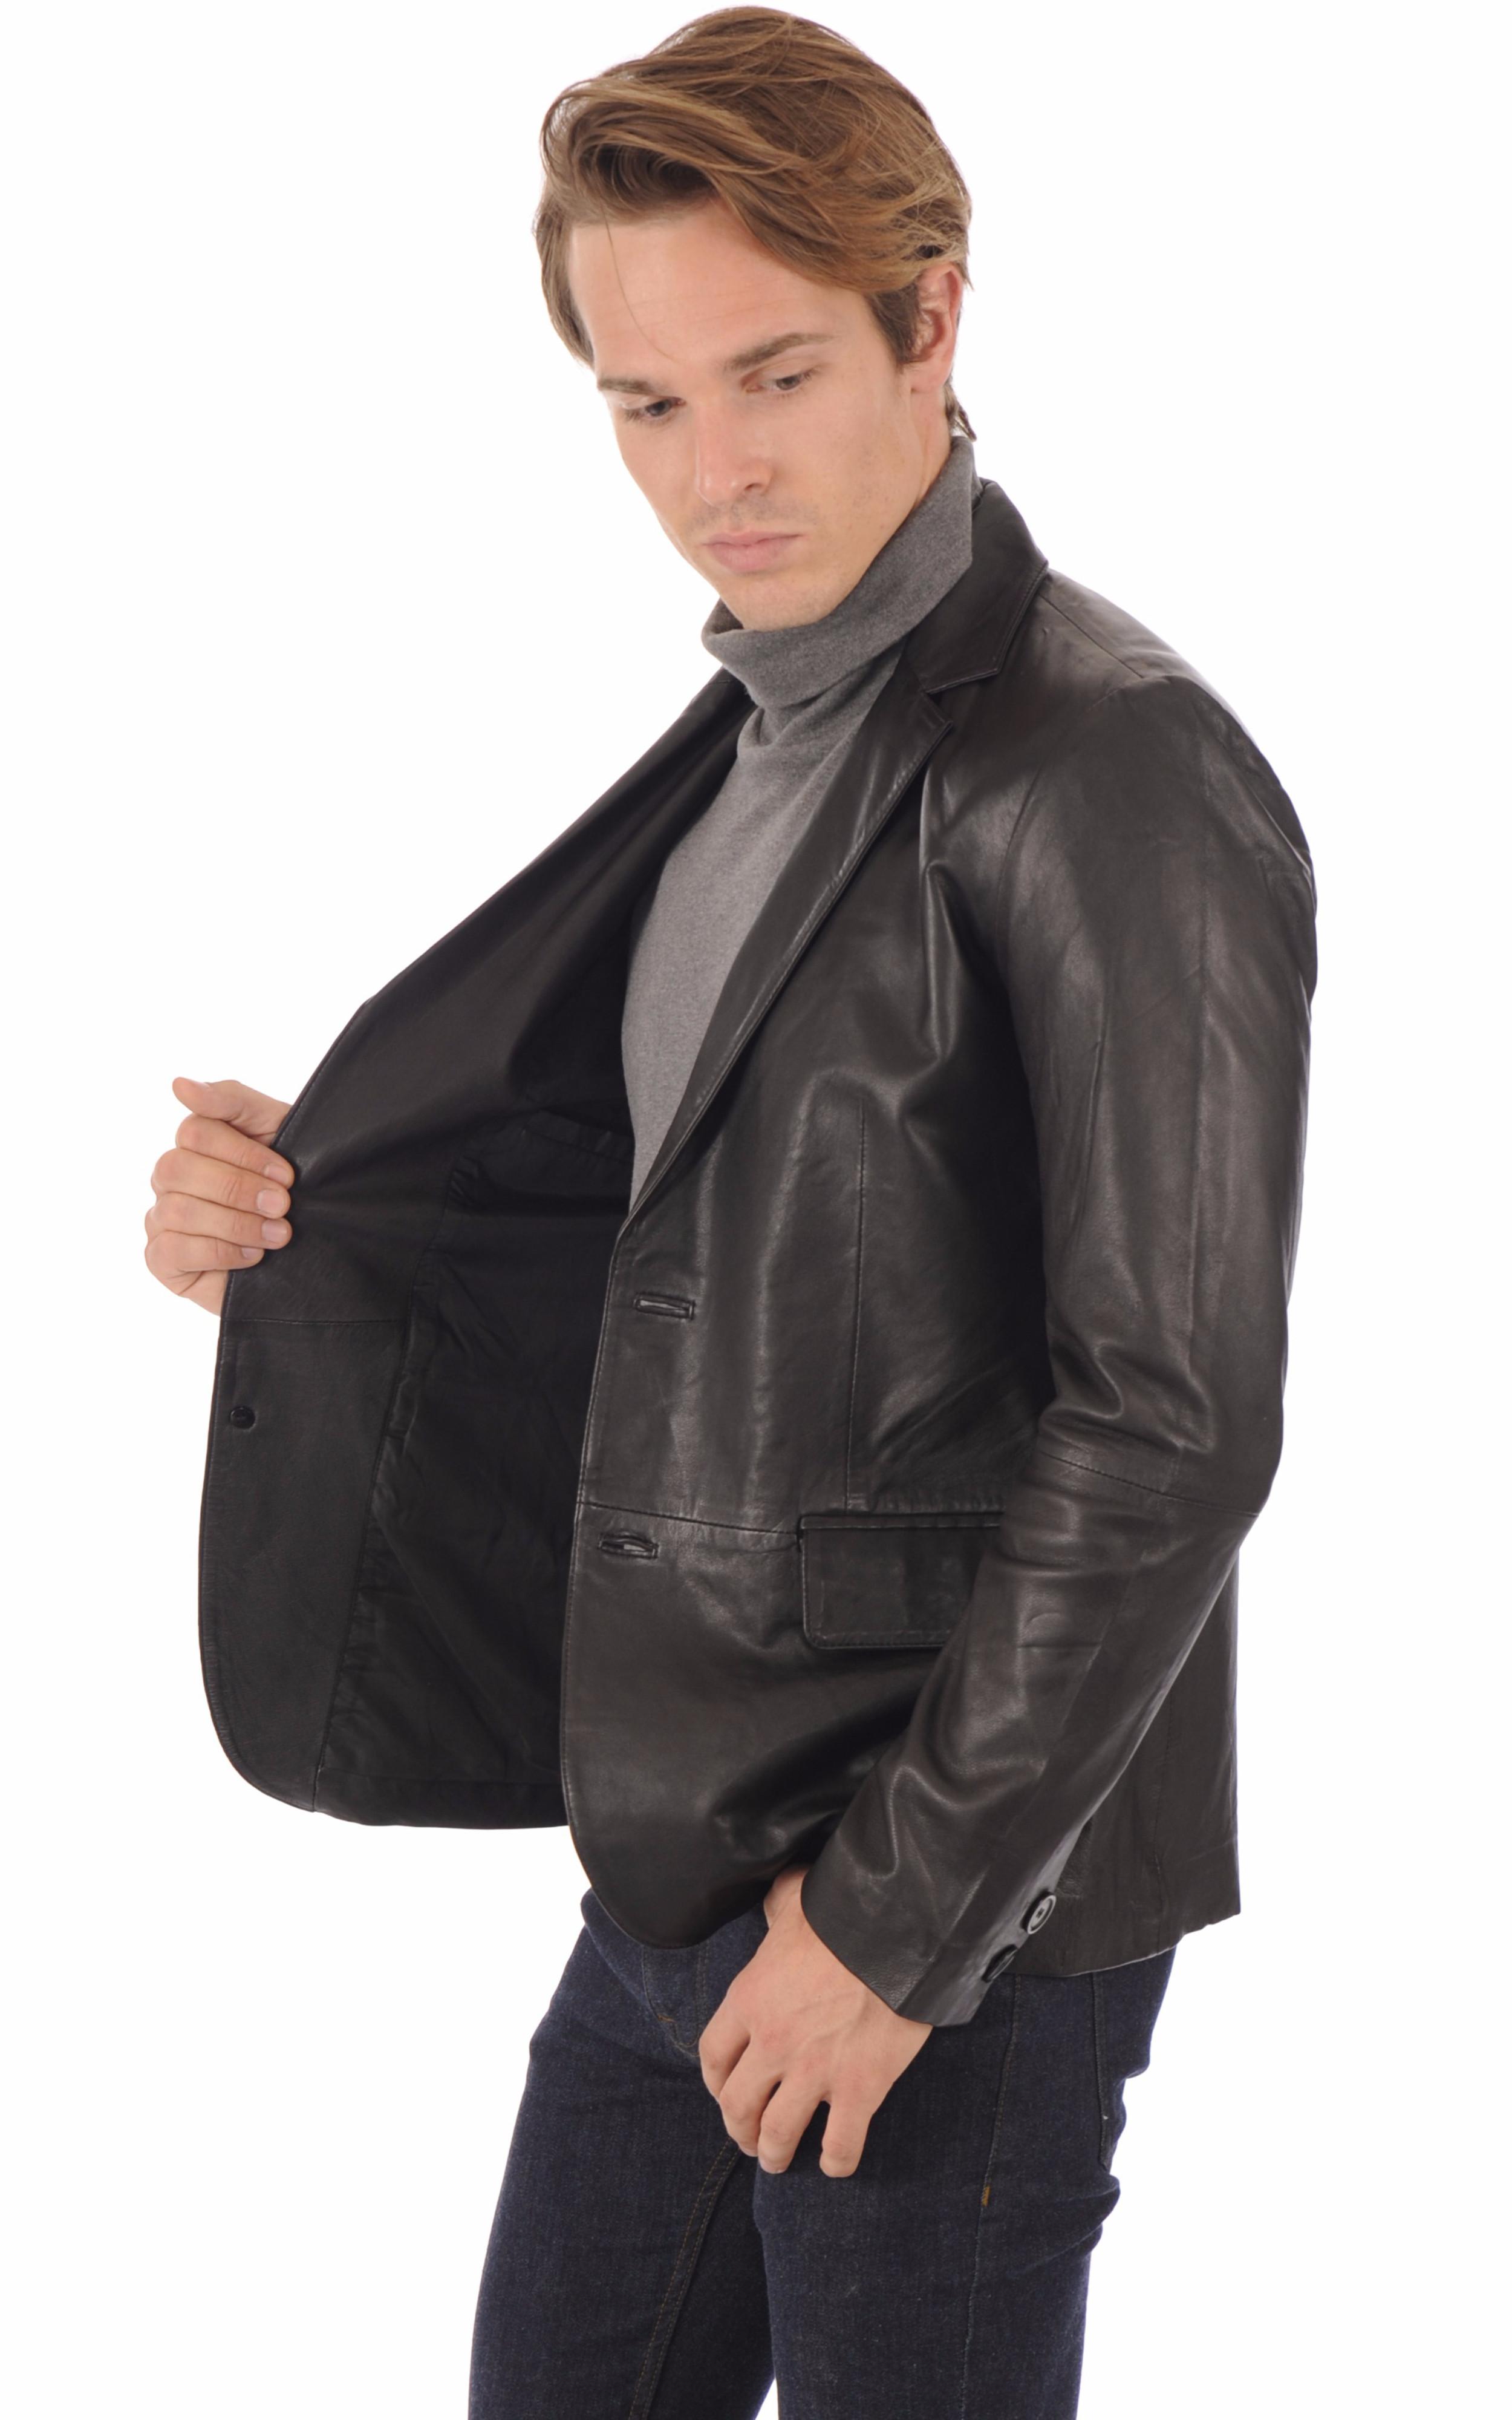 Blazer cuir noir homme La Canadienne